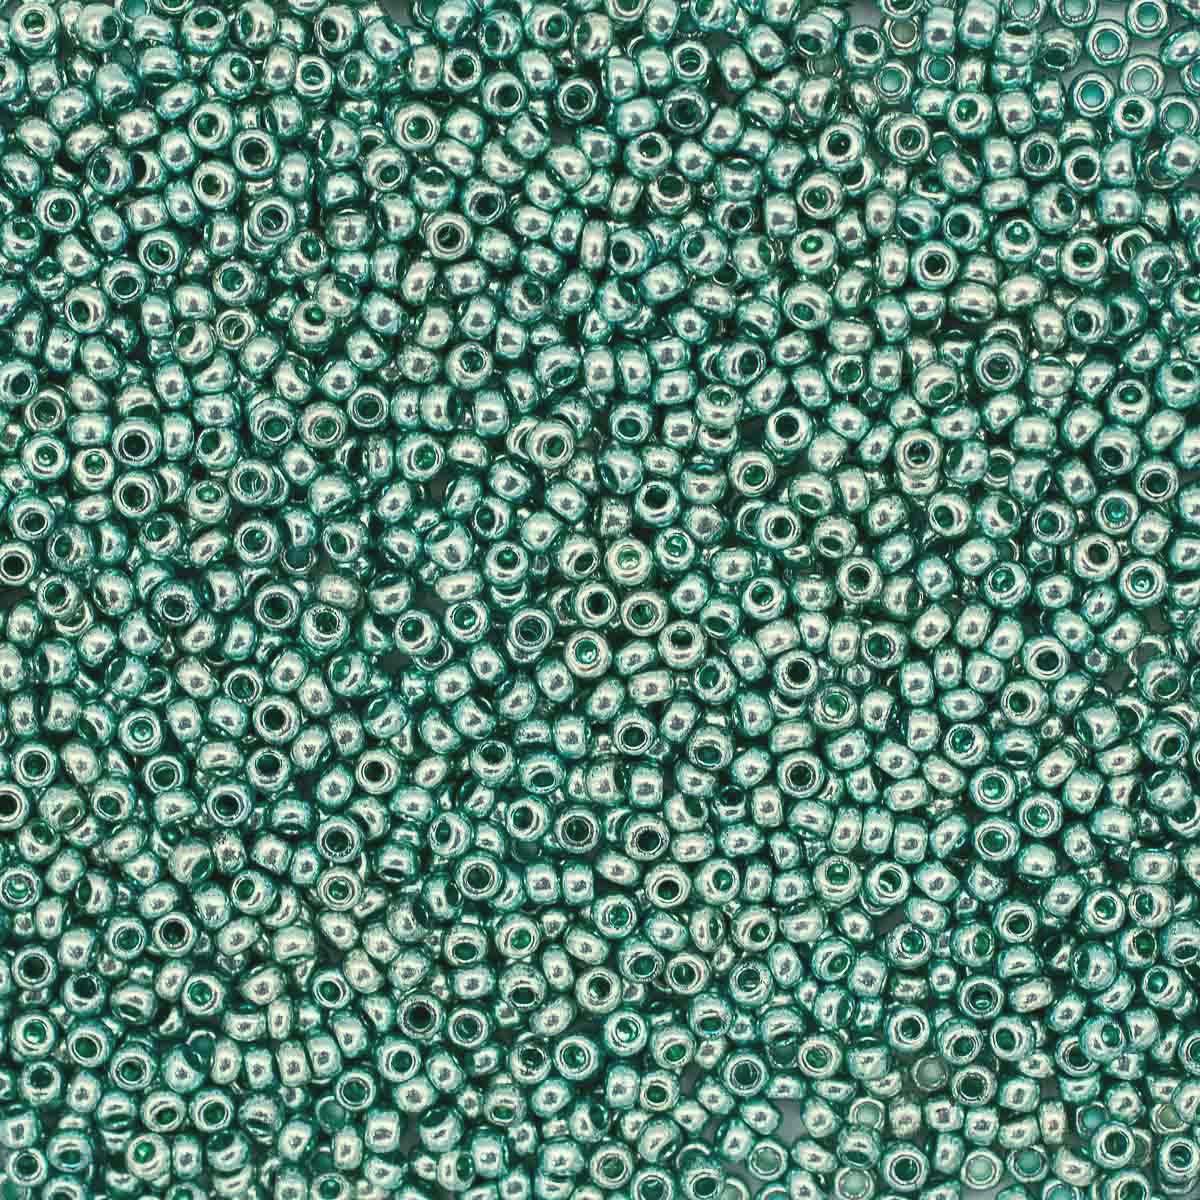 331-19001-10/0-18165 Бисер прозрачный solgel 10/0, круг.отв., 20гр Preciosa